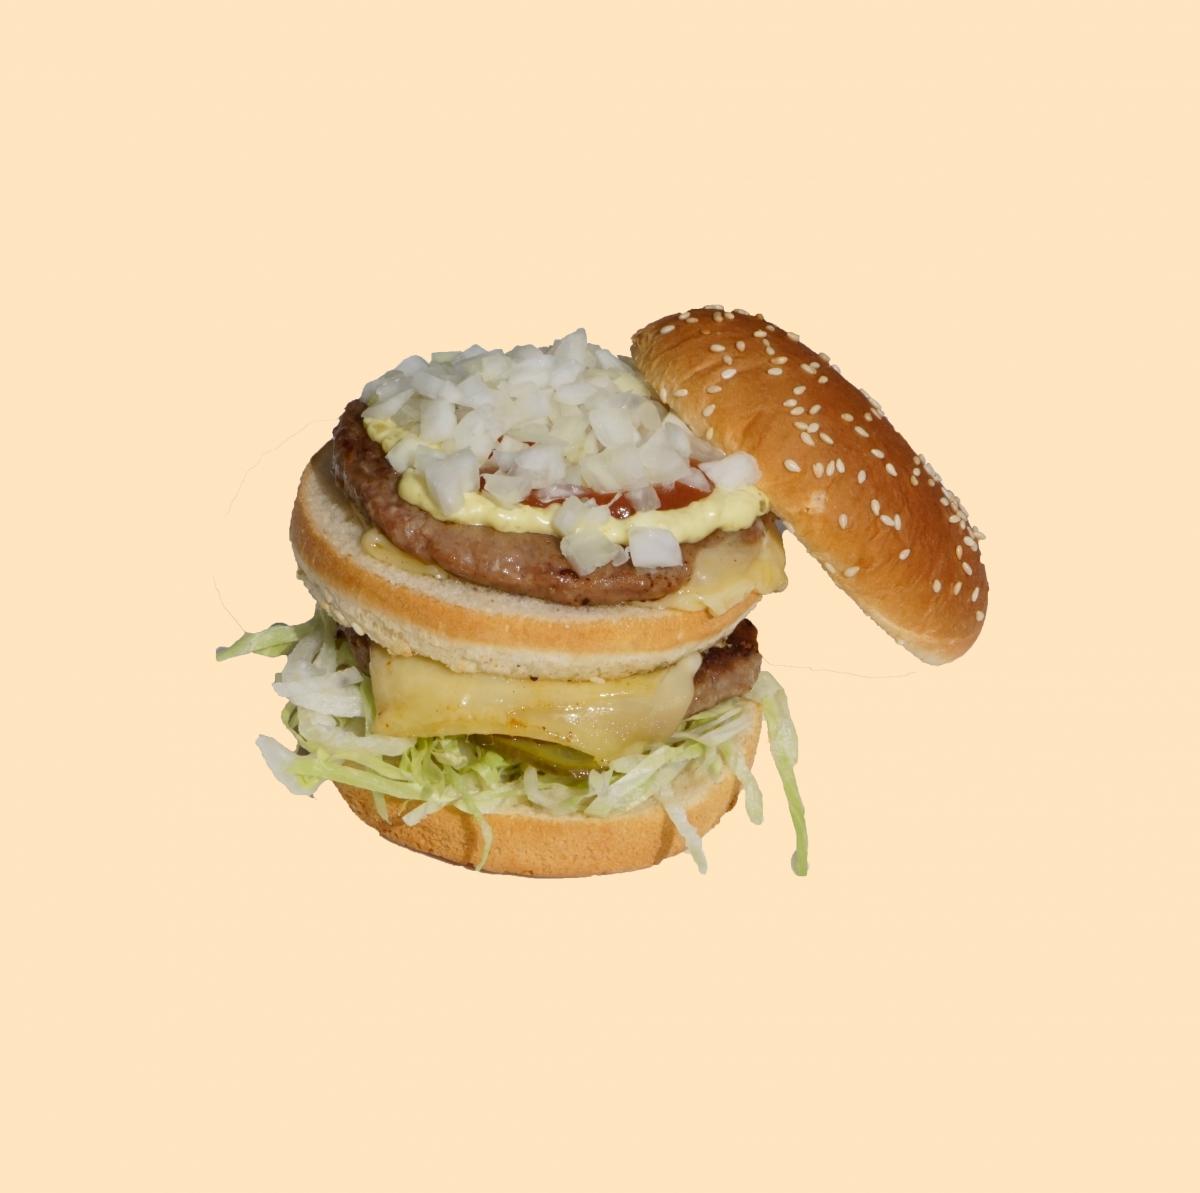 Dubbelburger cheese